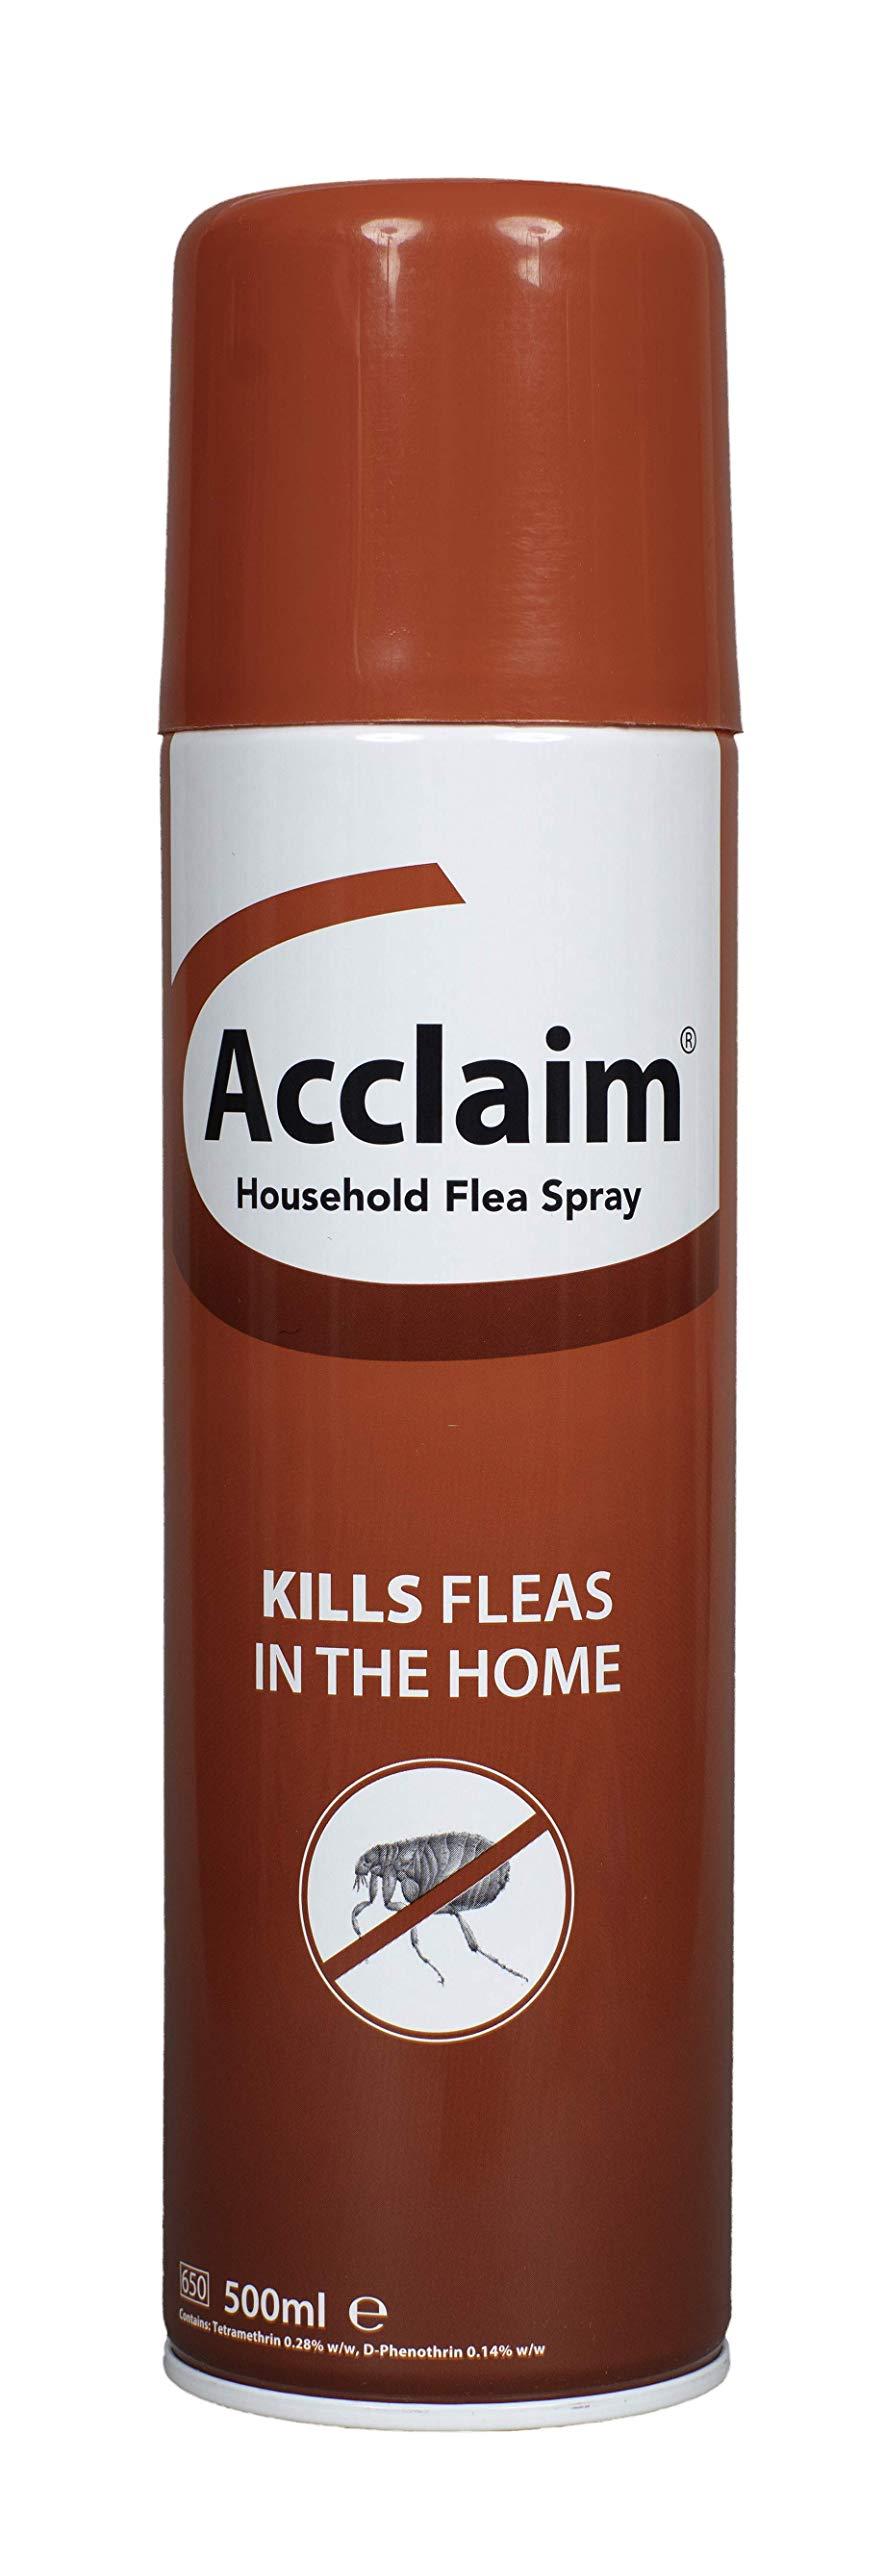 Acclaim Household Flea Spray, 500ml Aerosol